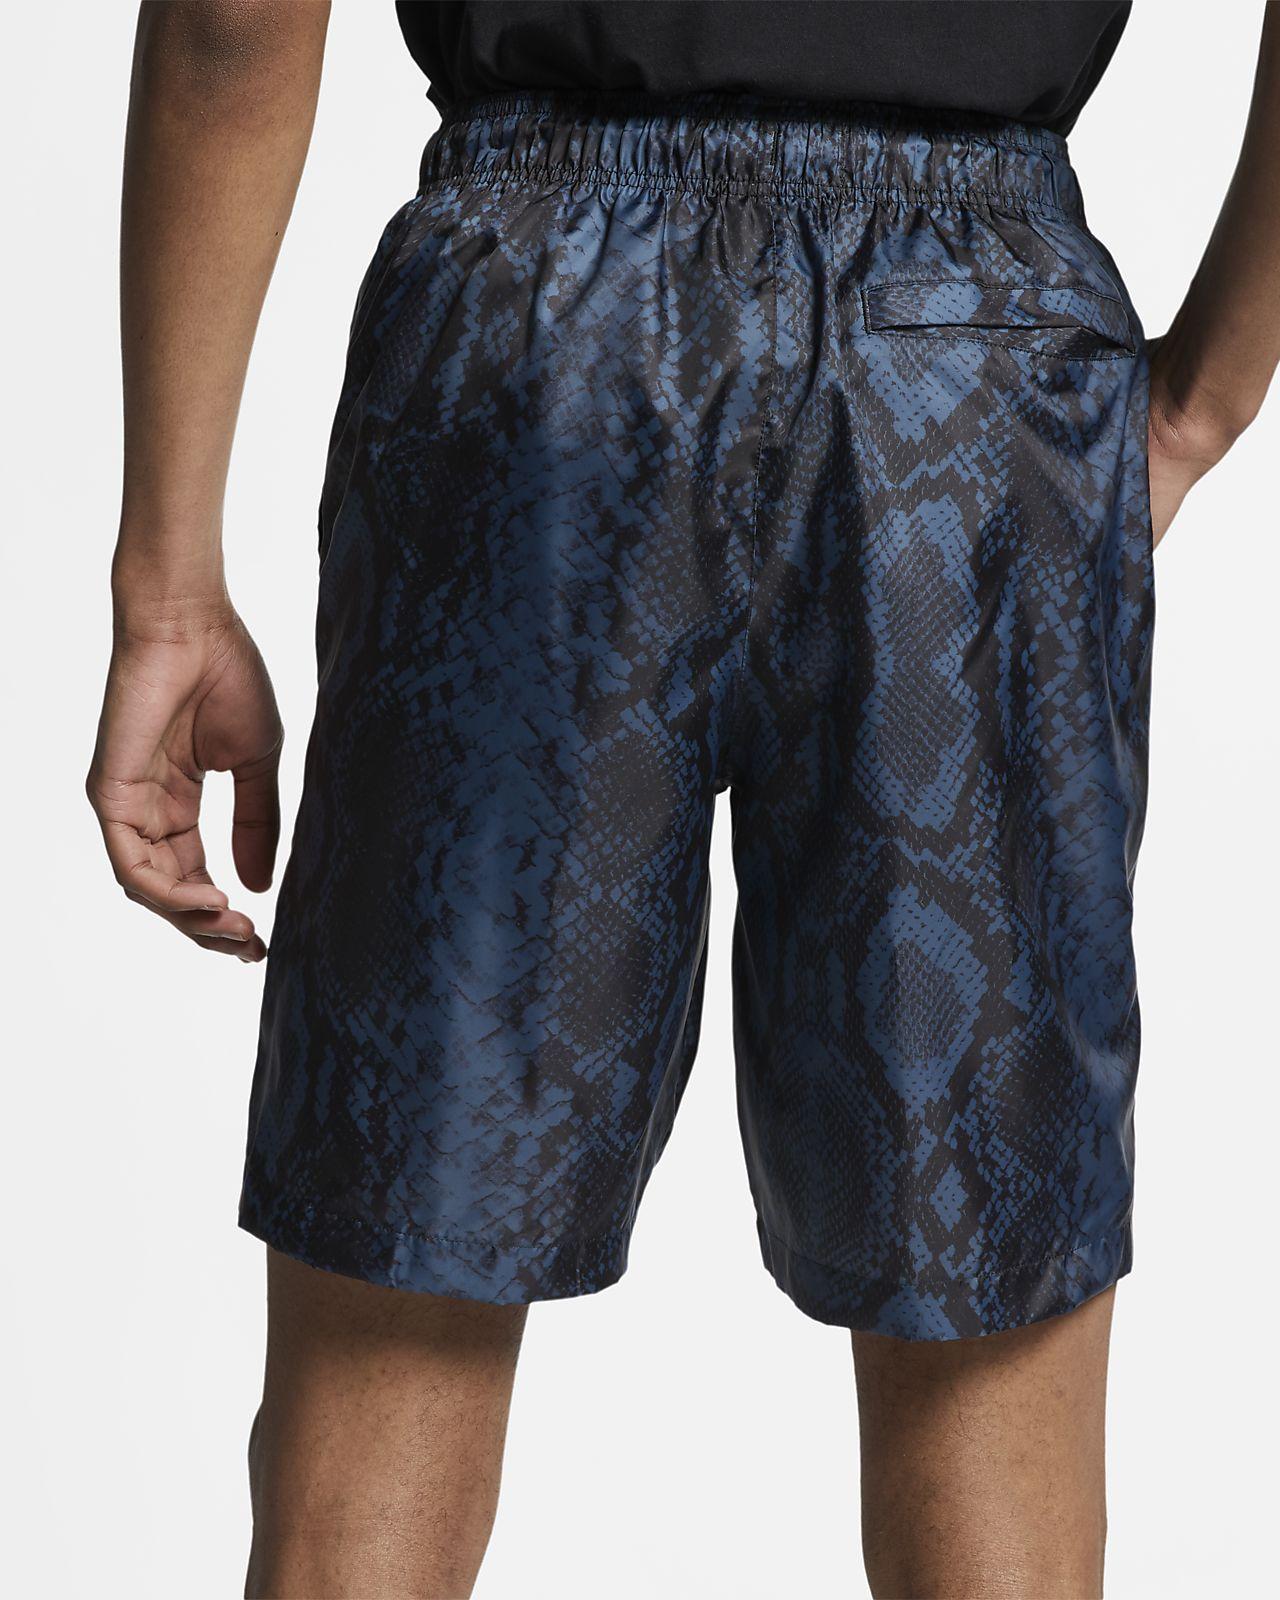 4faec82ba4 Jordan AJ11 Snakeskin Men's Shorts. Nike.com